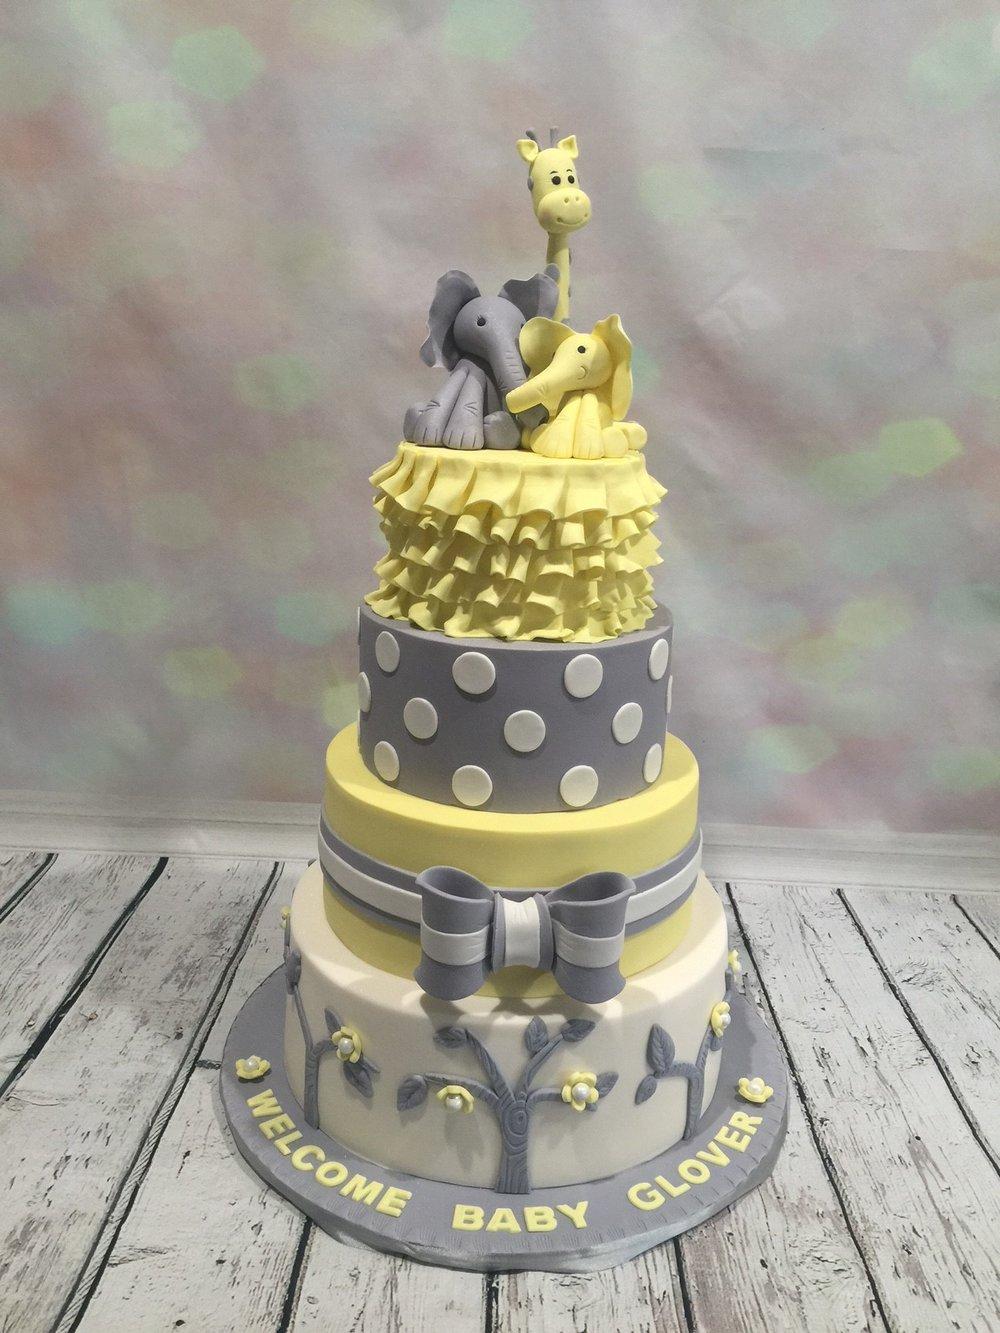 Yellow-and-grey-elephant-and-giraffe-baby-shower-cake.JPG